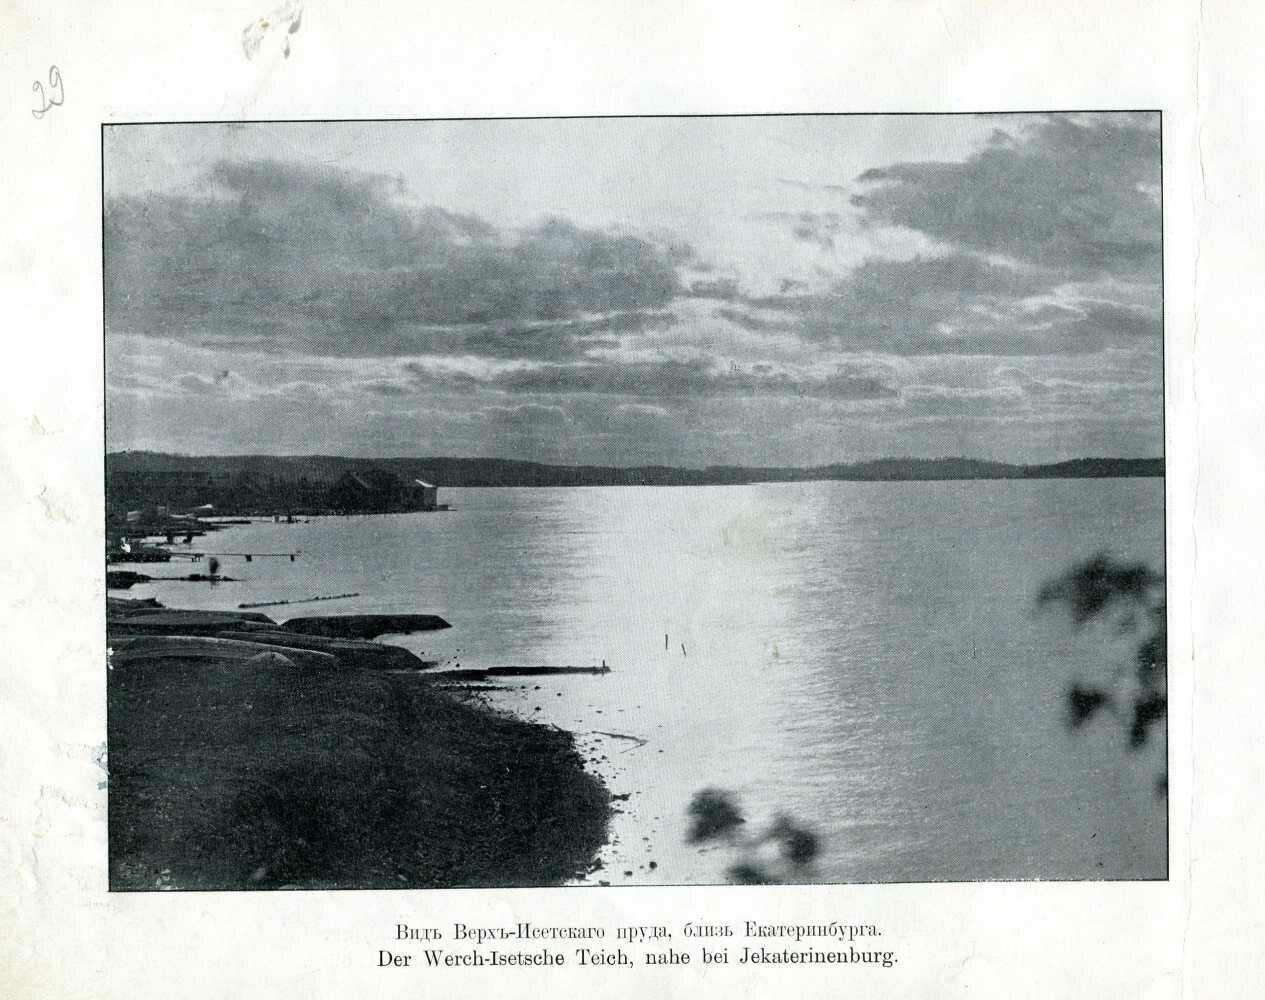 29. Вид Верх-Исетского пруда, близ Екатеринбурга